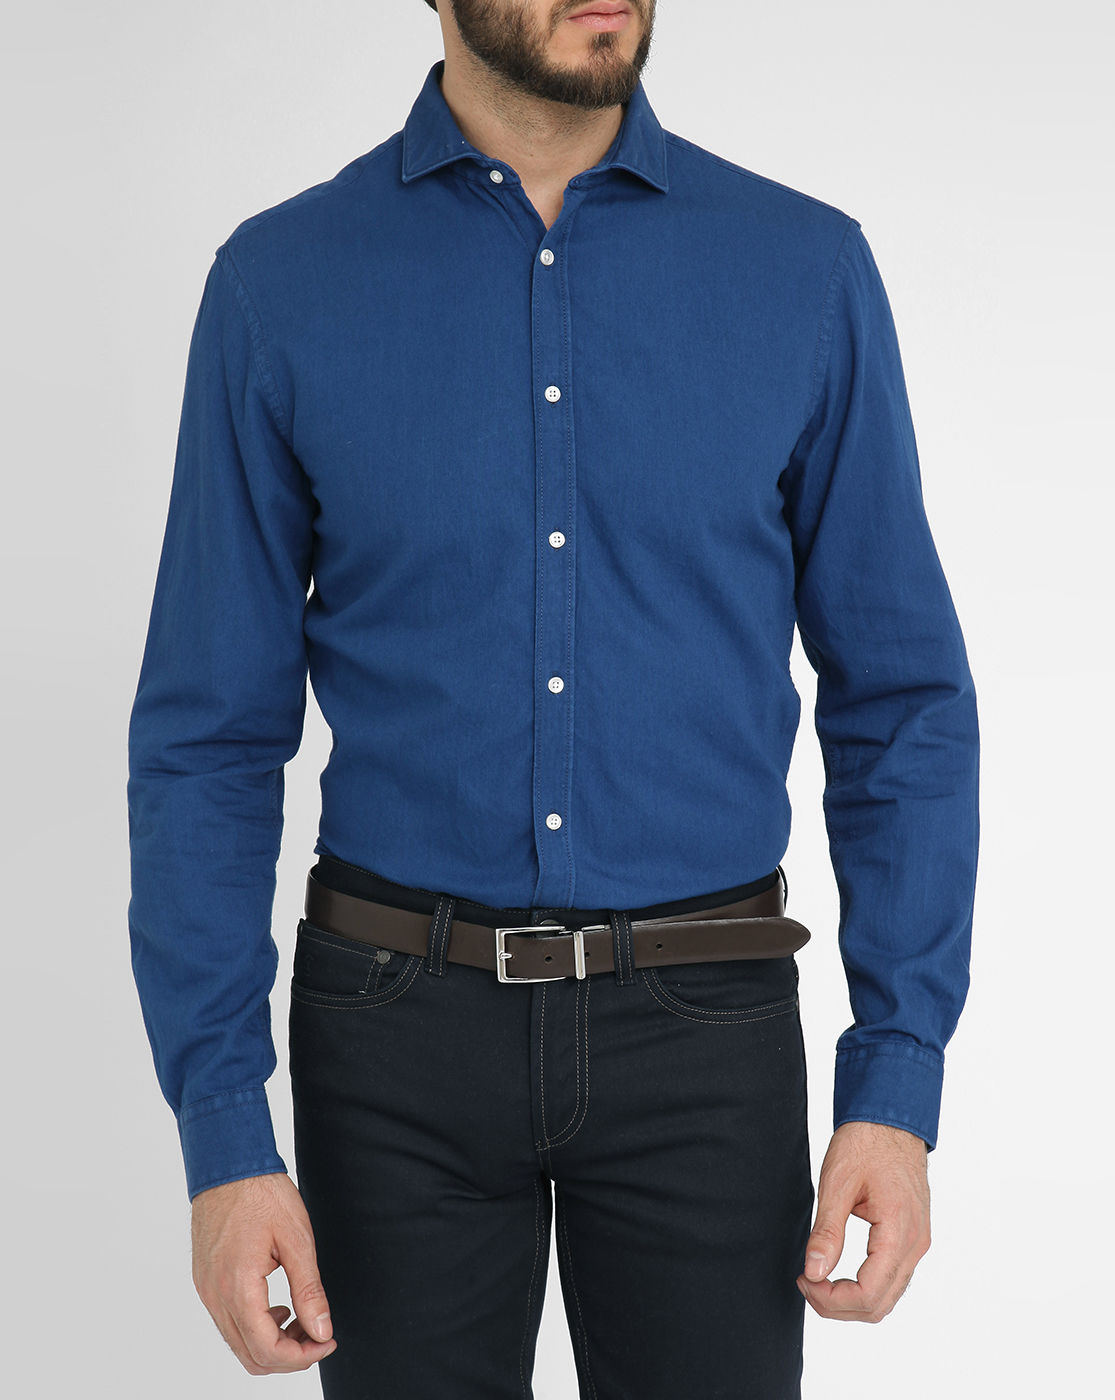 Celio Club Navy Denim Slim Fit Shirt In Blue For Men Lyst